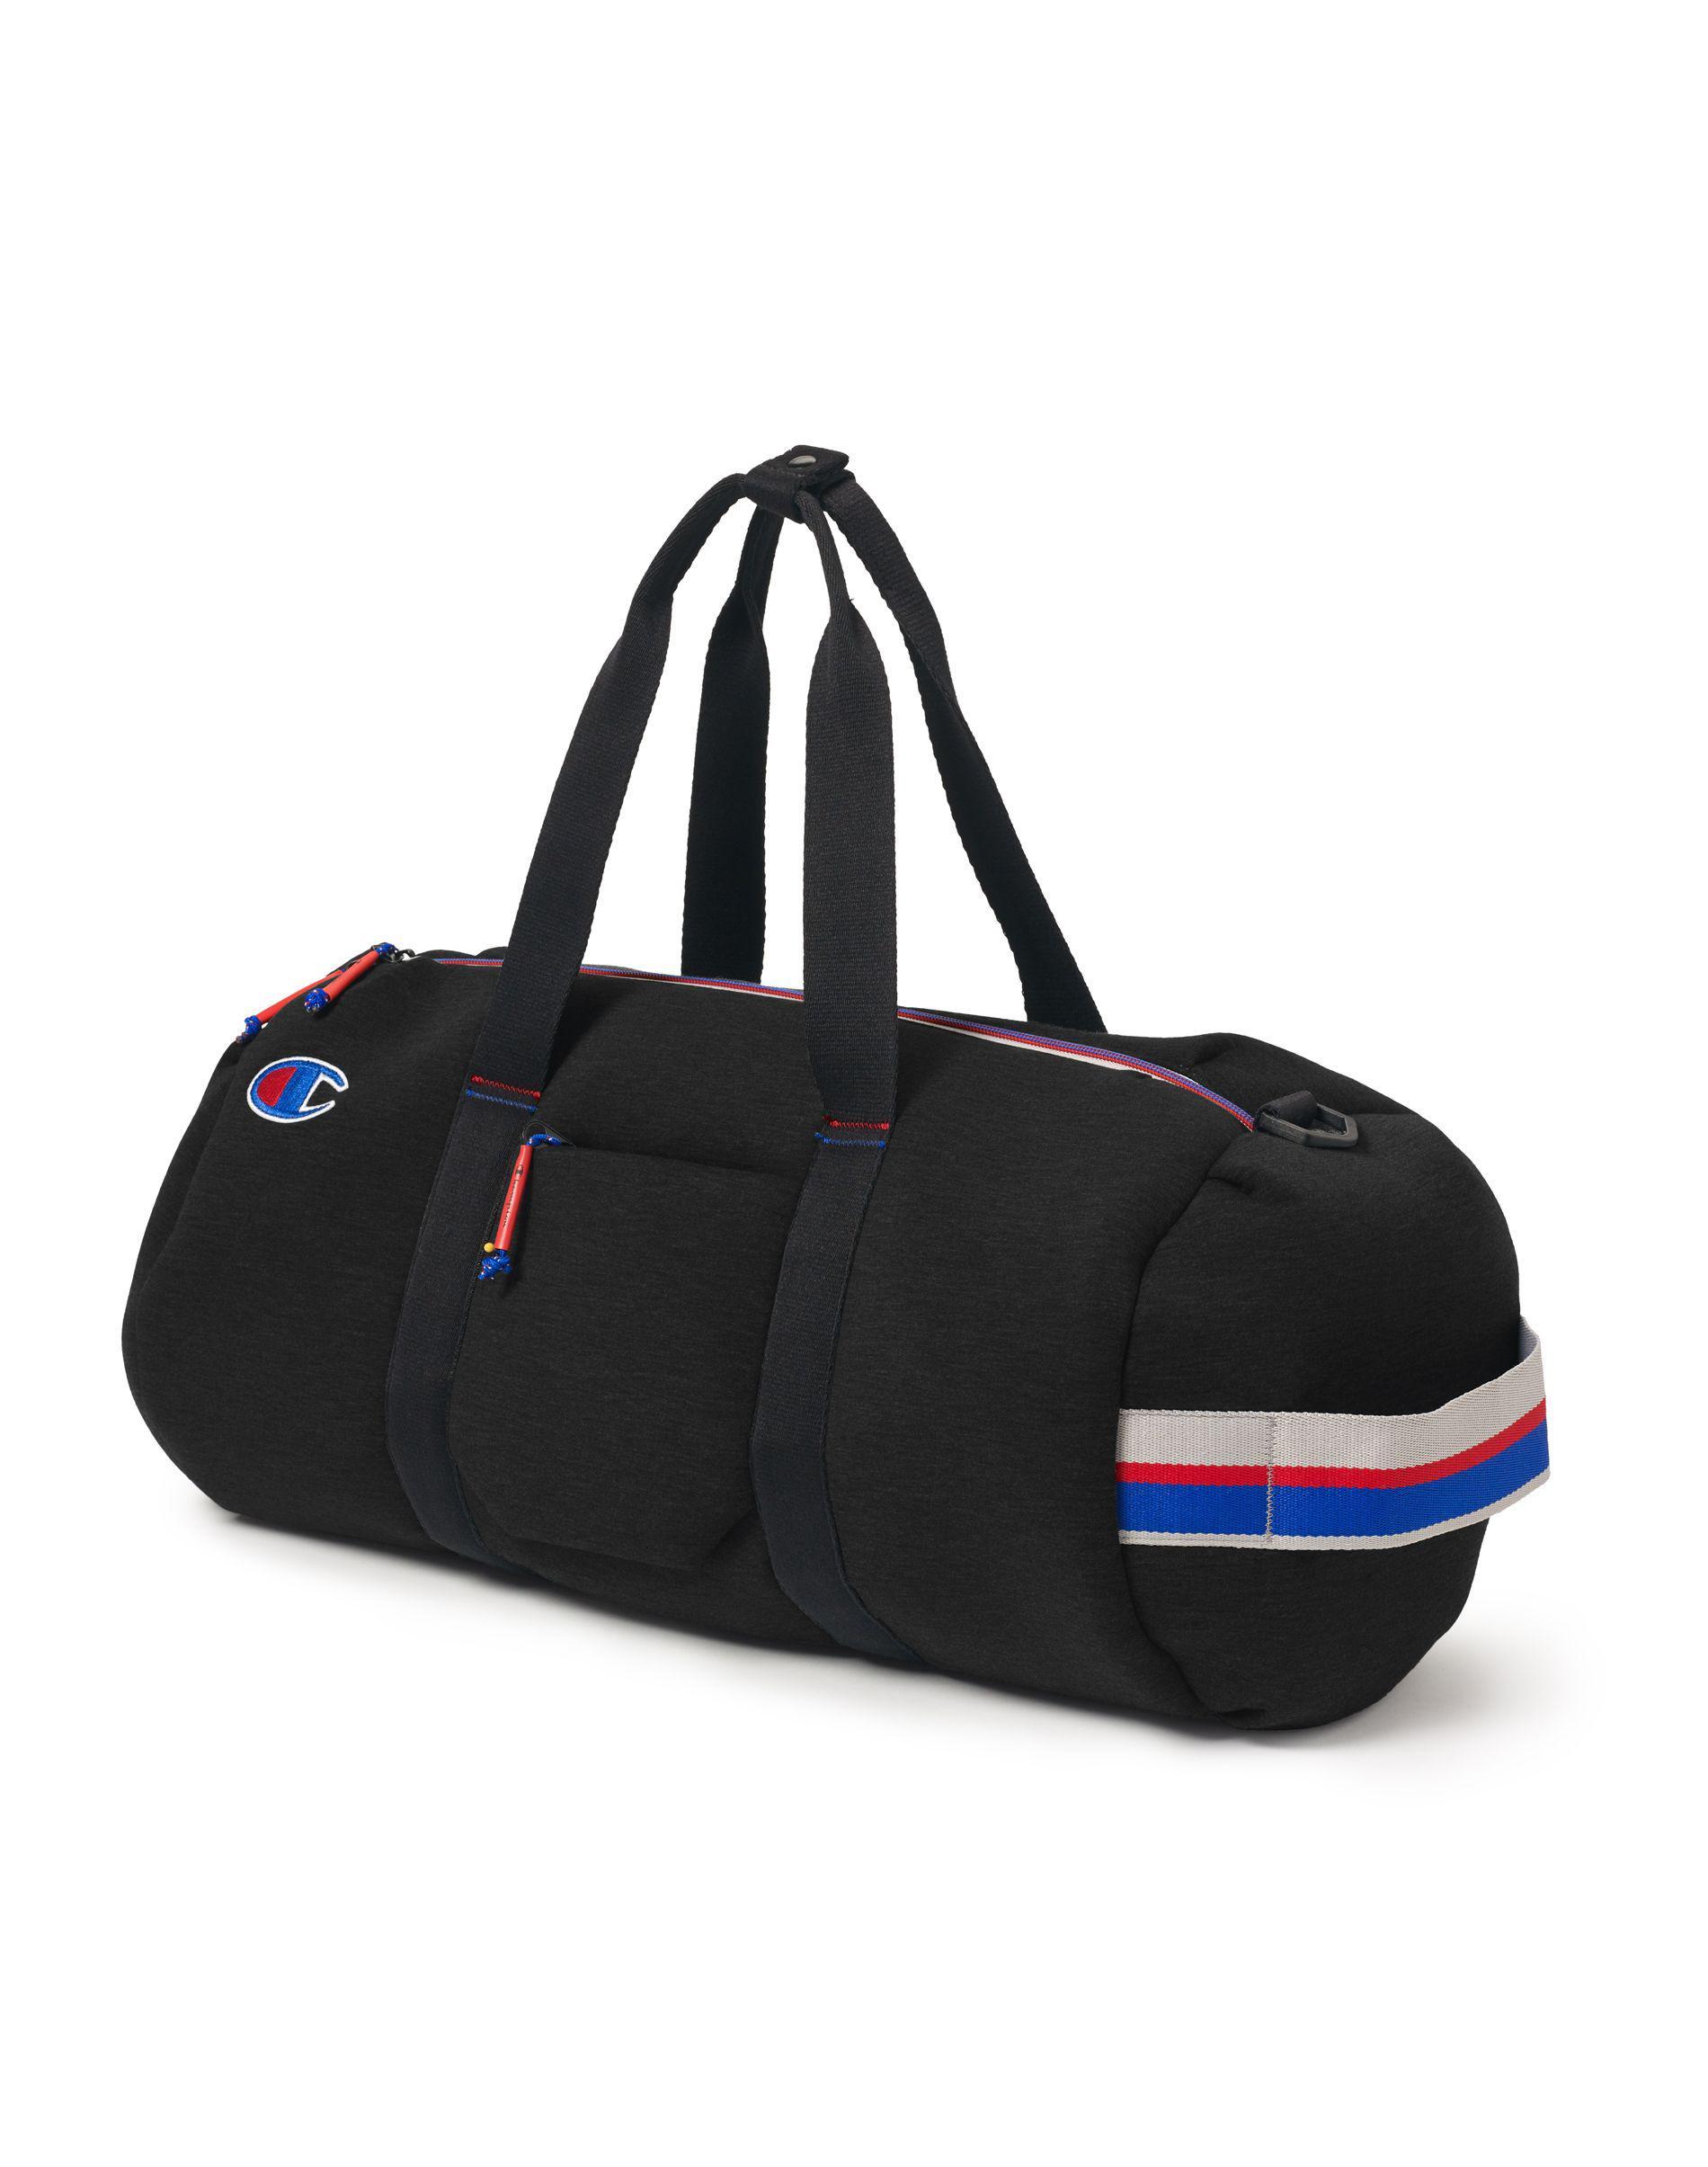 6940a7fbda06 Lyst - Champion Life® The Attribute Duffel Bag in Black